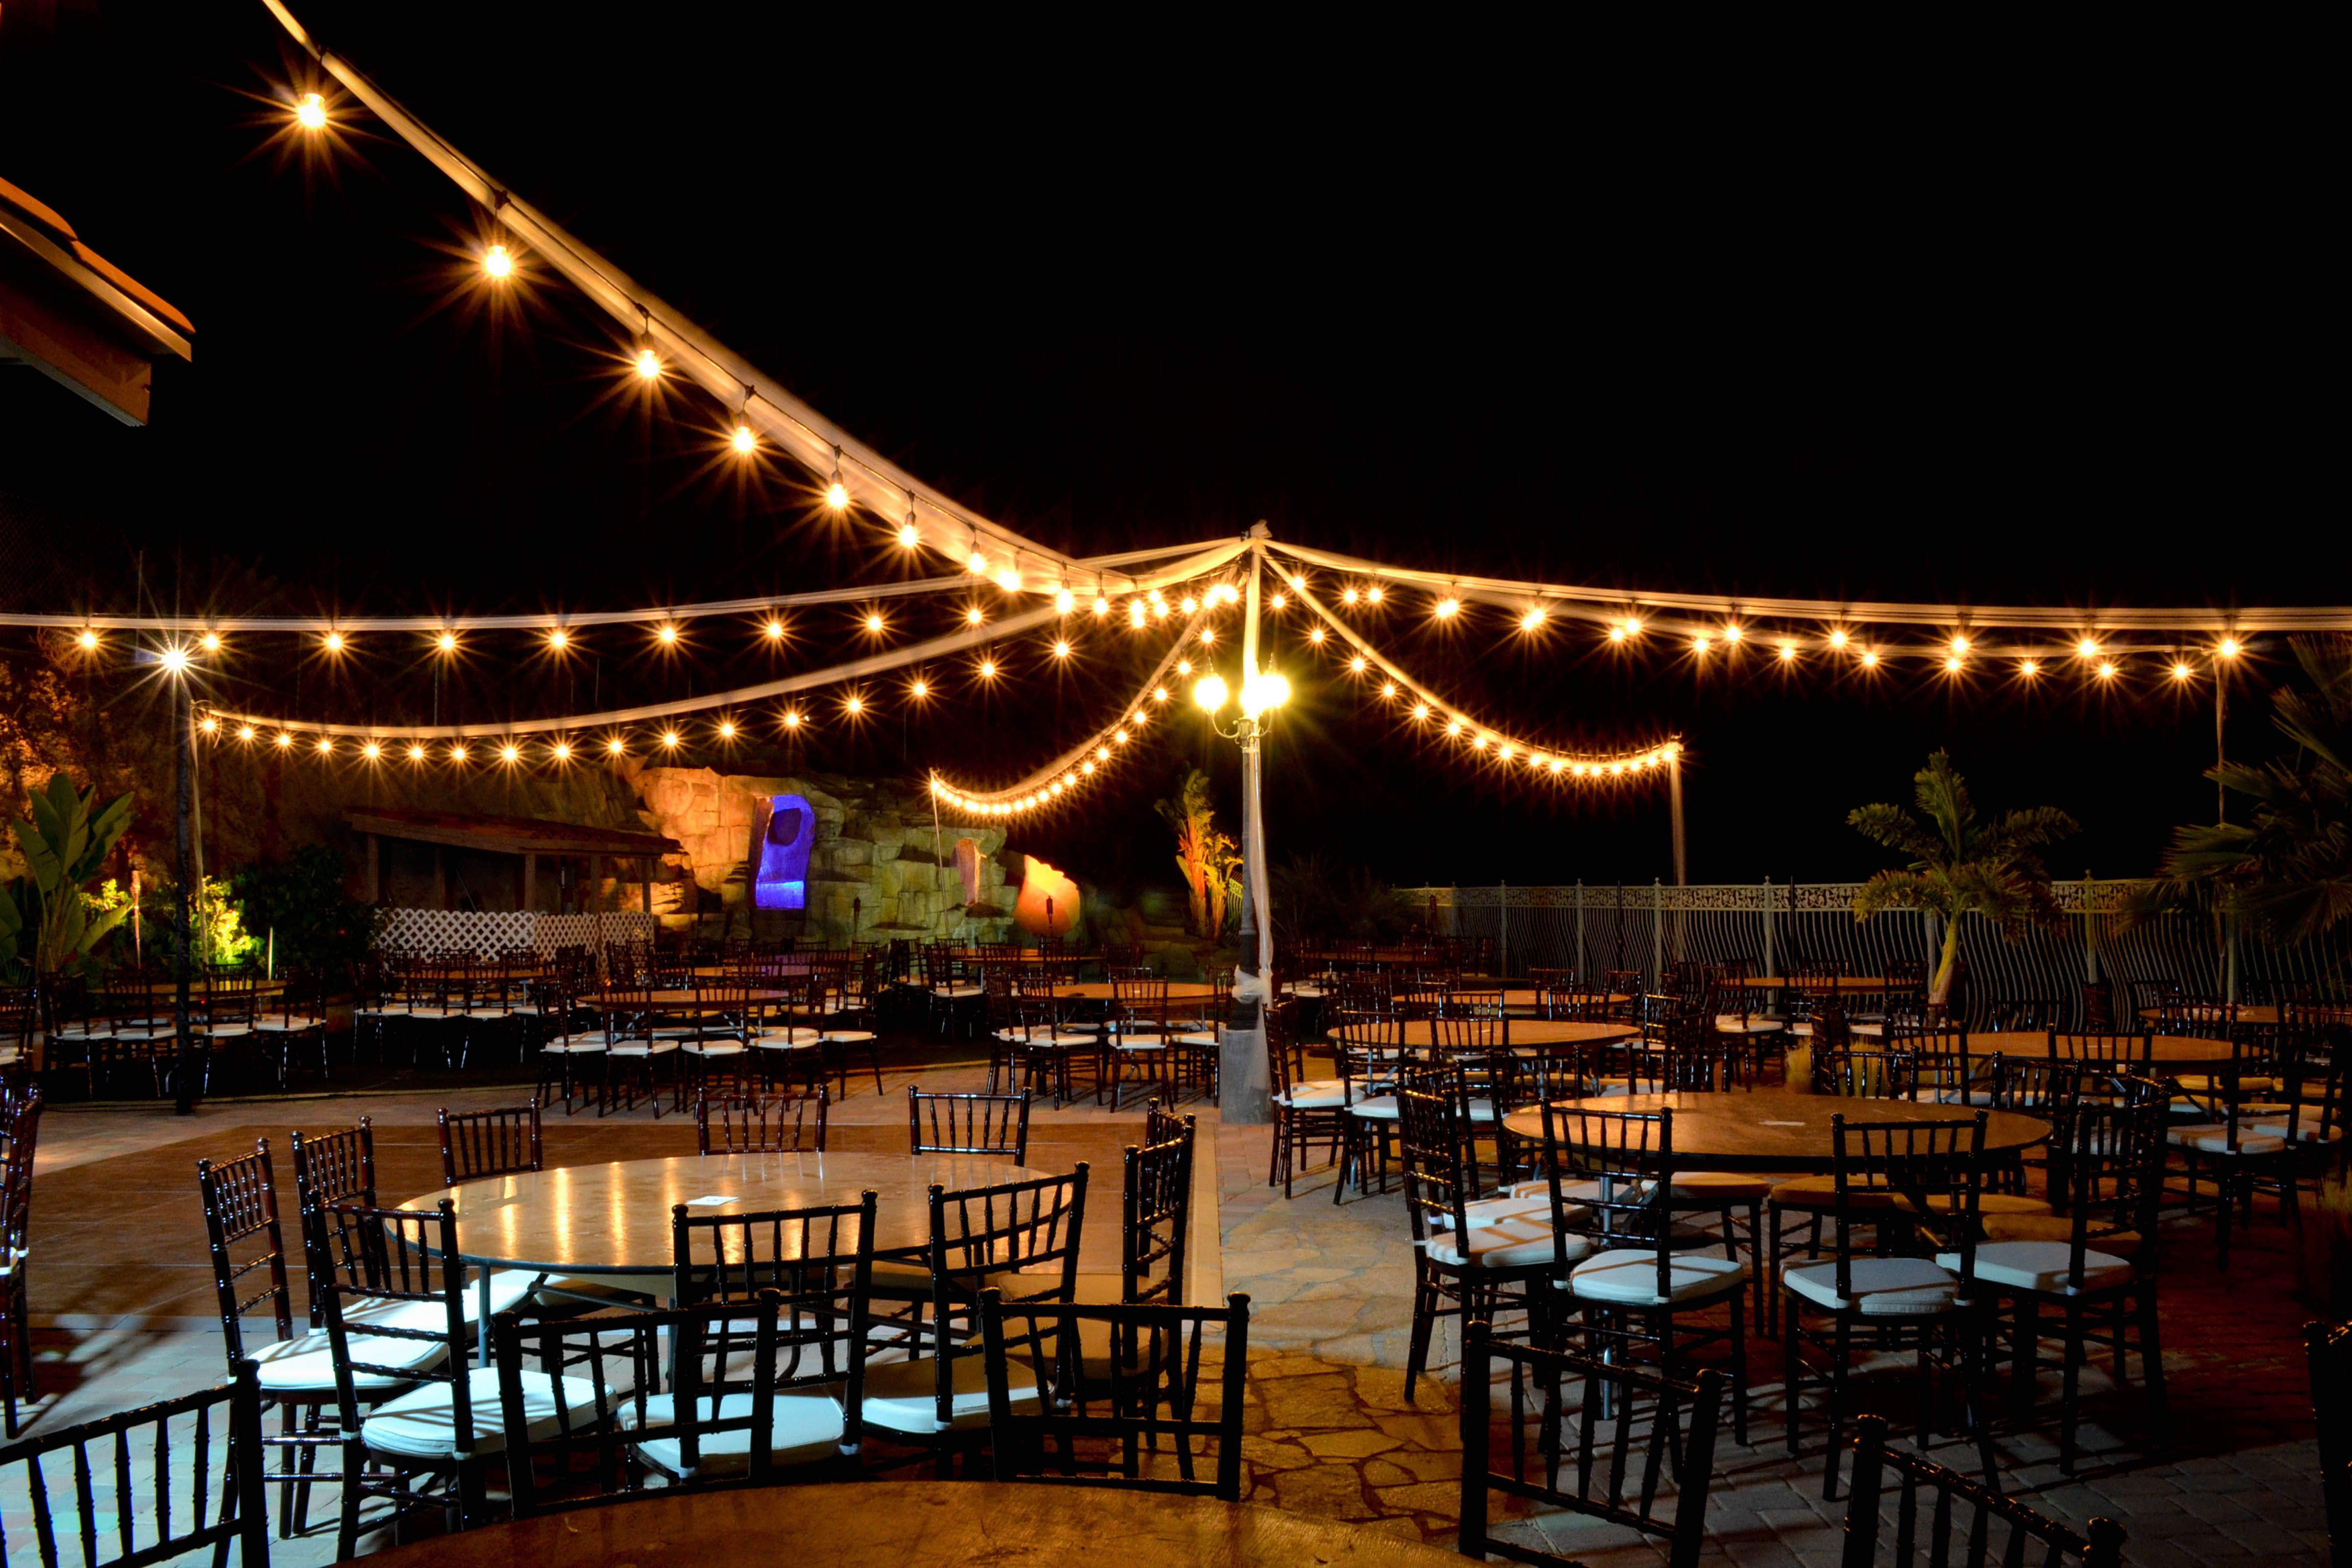 wedding overhead lighting Google Search Festoon